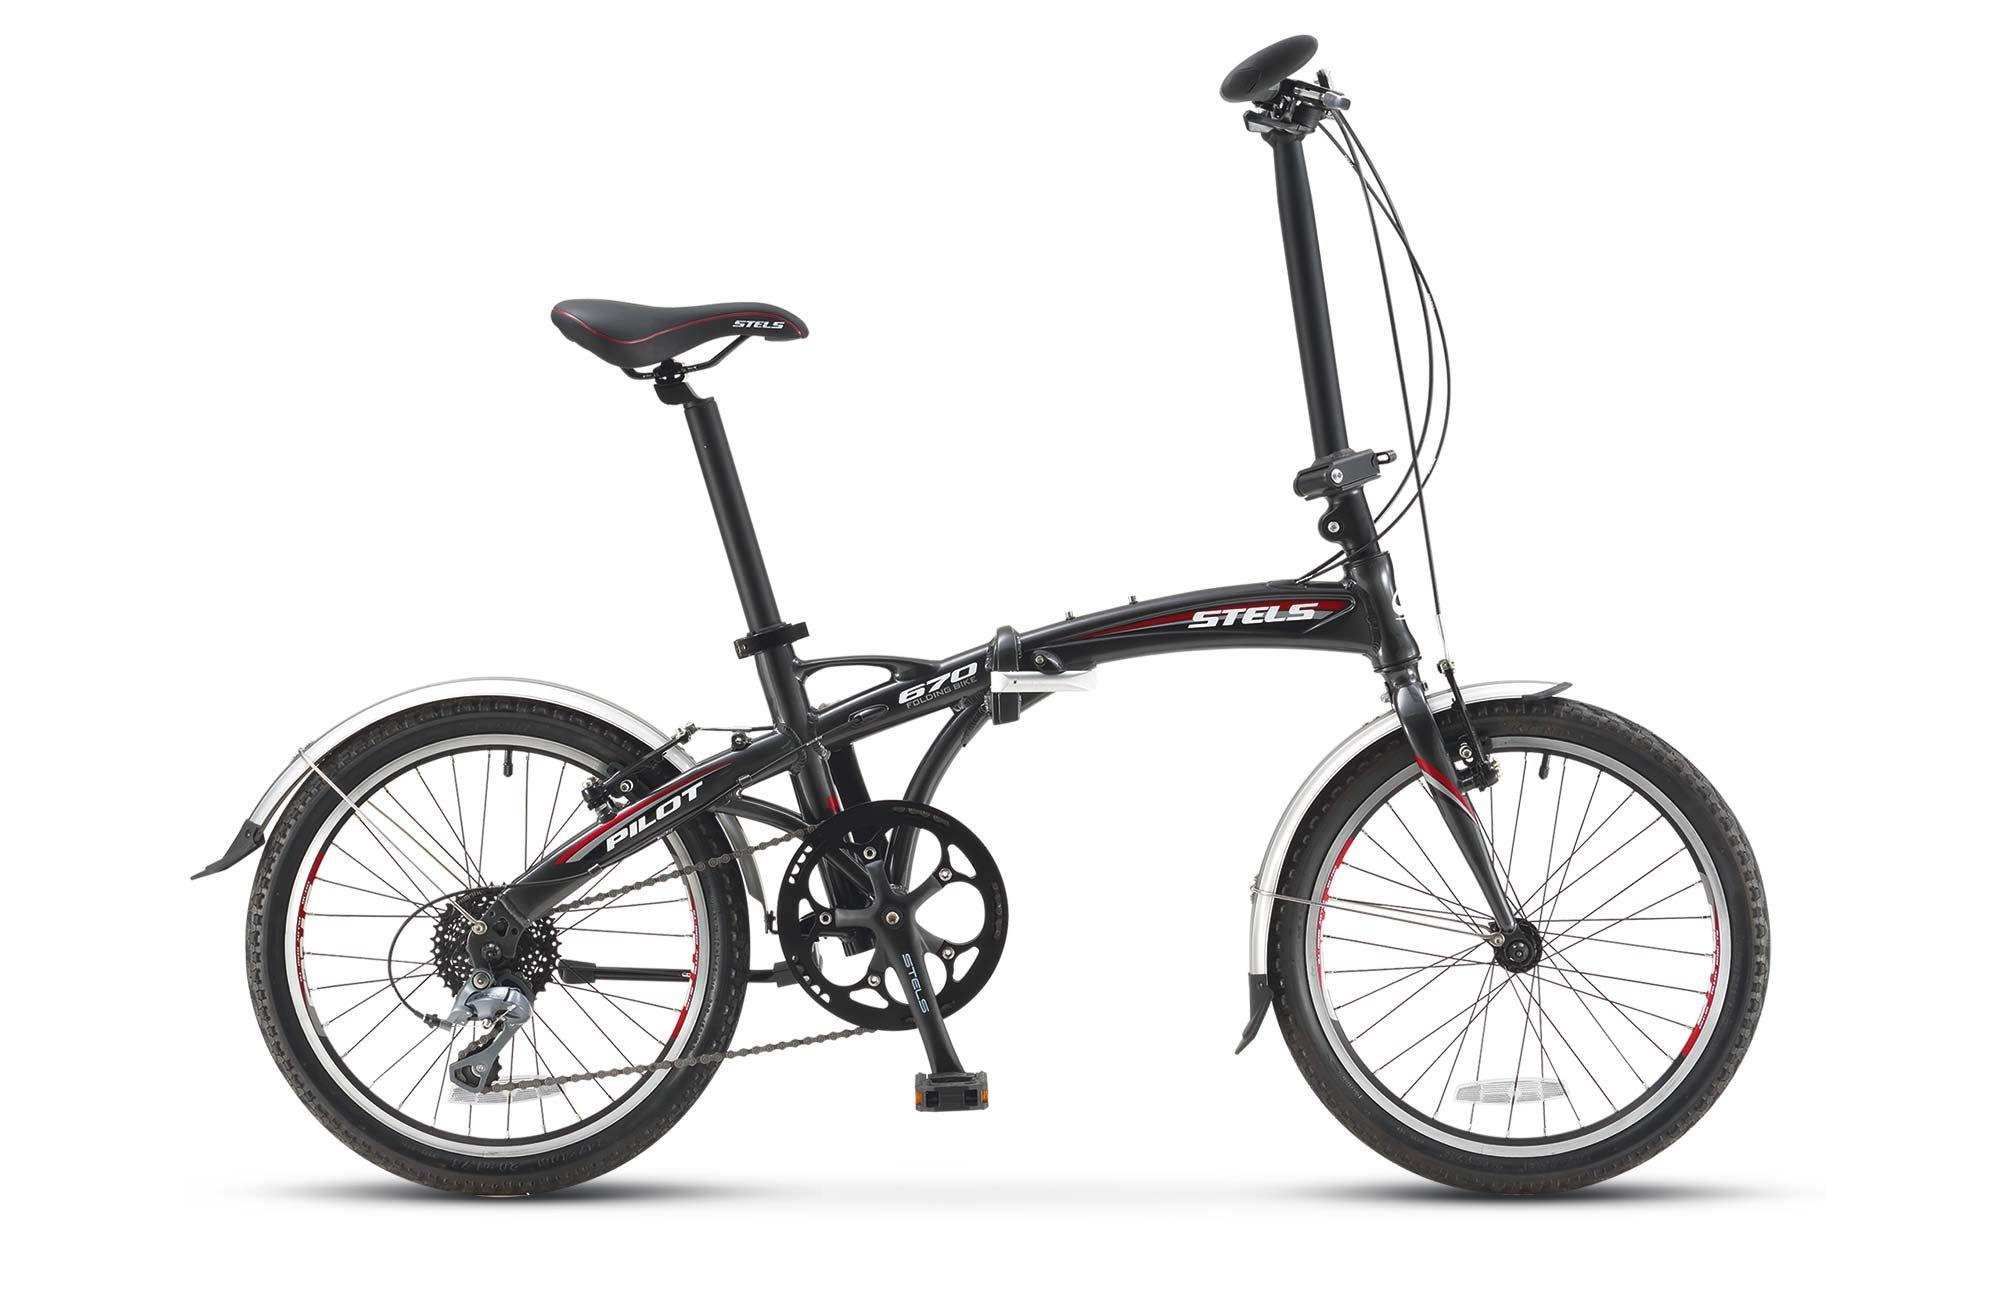 Велосипед Stels Pilot 670 2016,  Складные  - артикул:262205